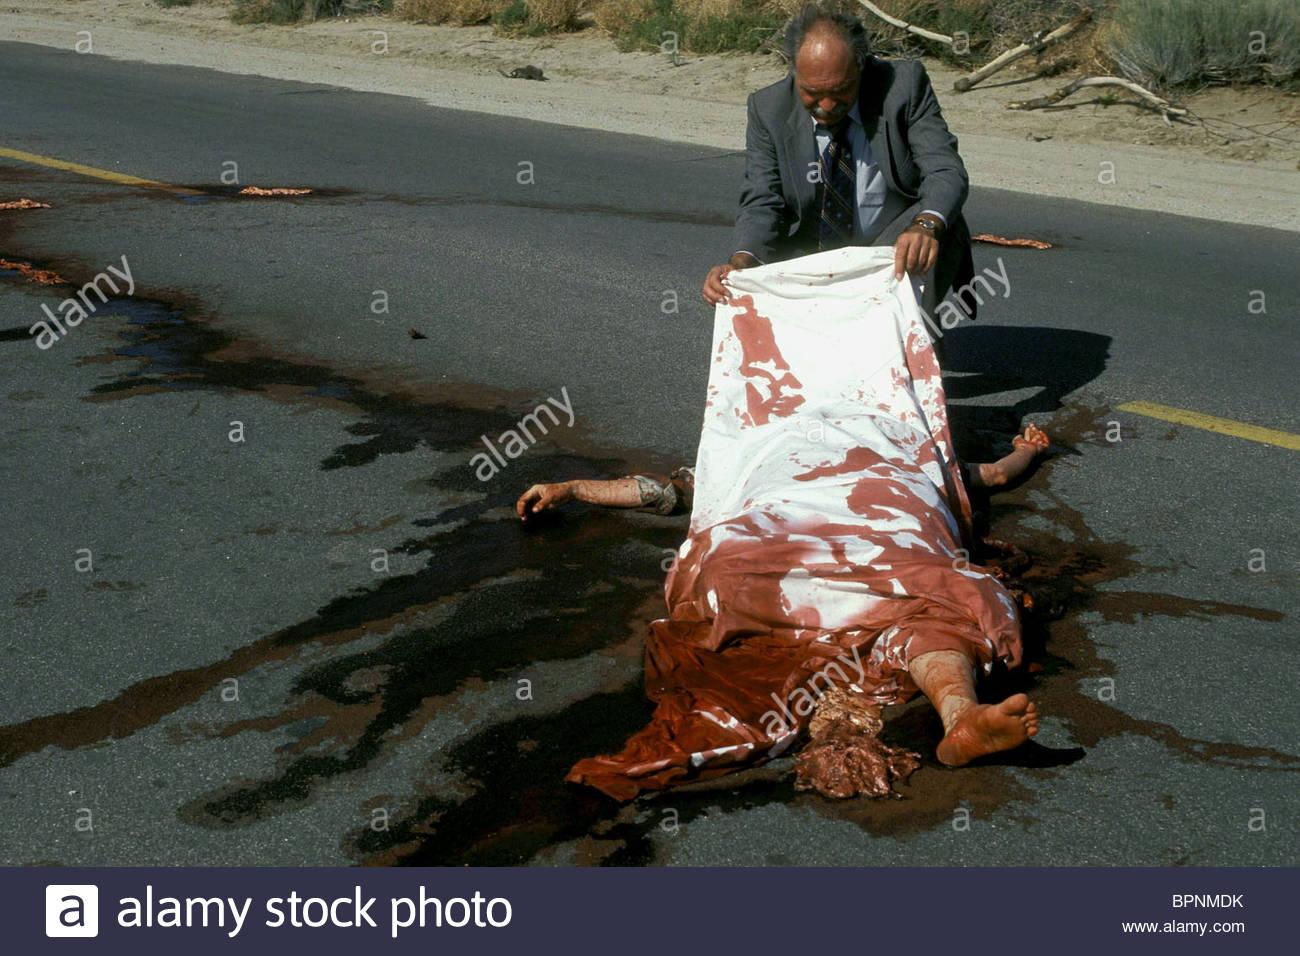 mutilated body stock photos mutilated body stock images alamy